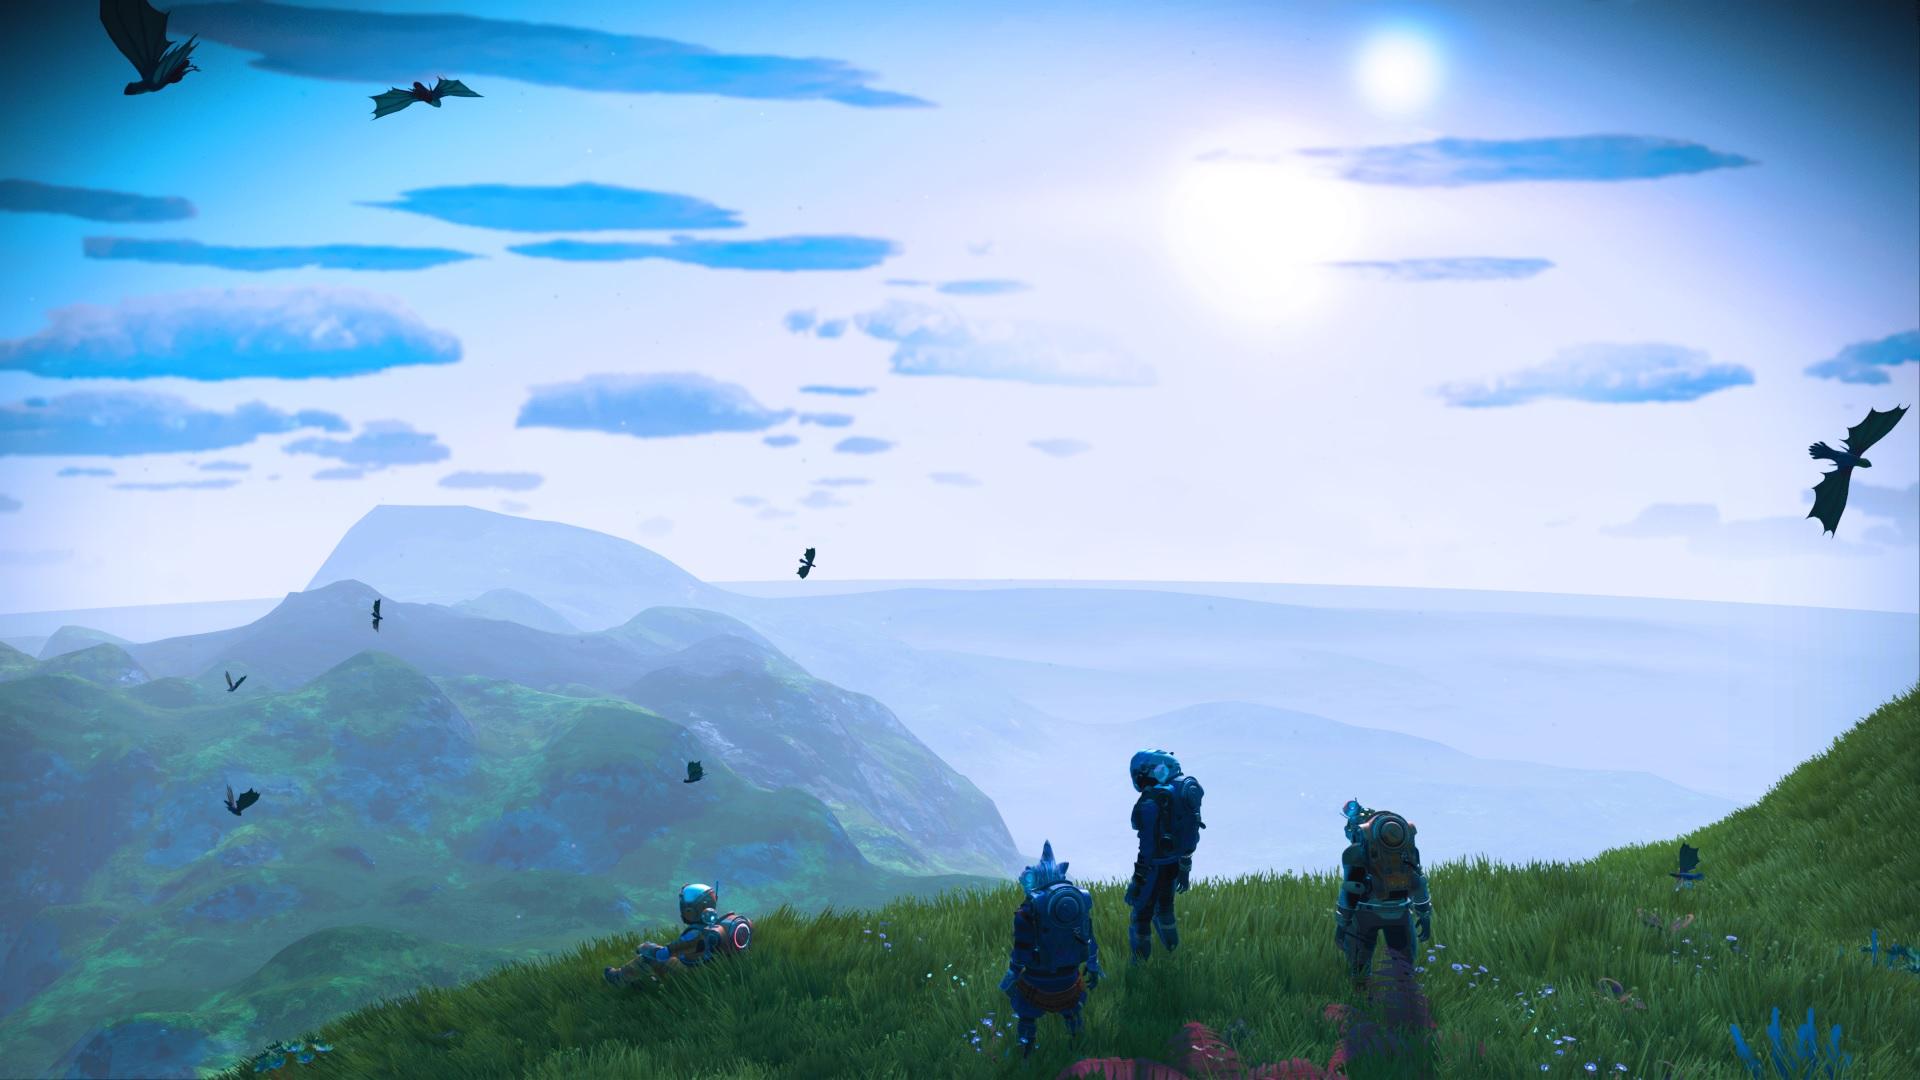 No Man's Sky Panorama